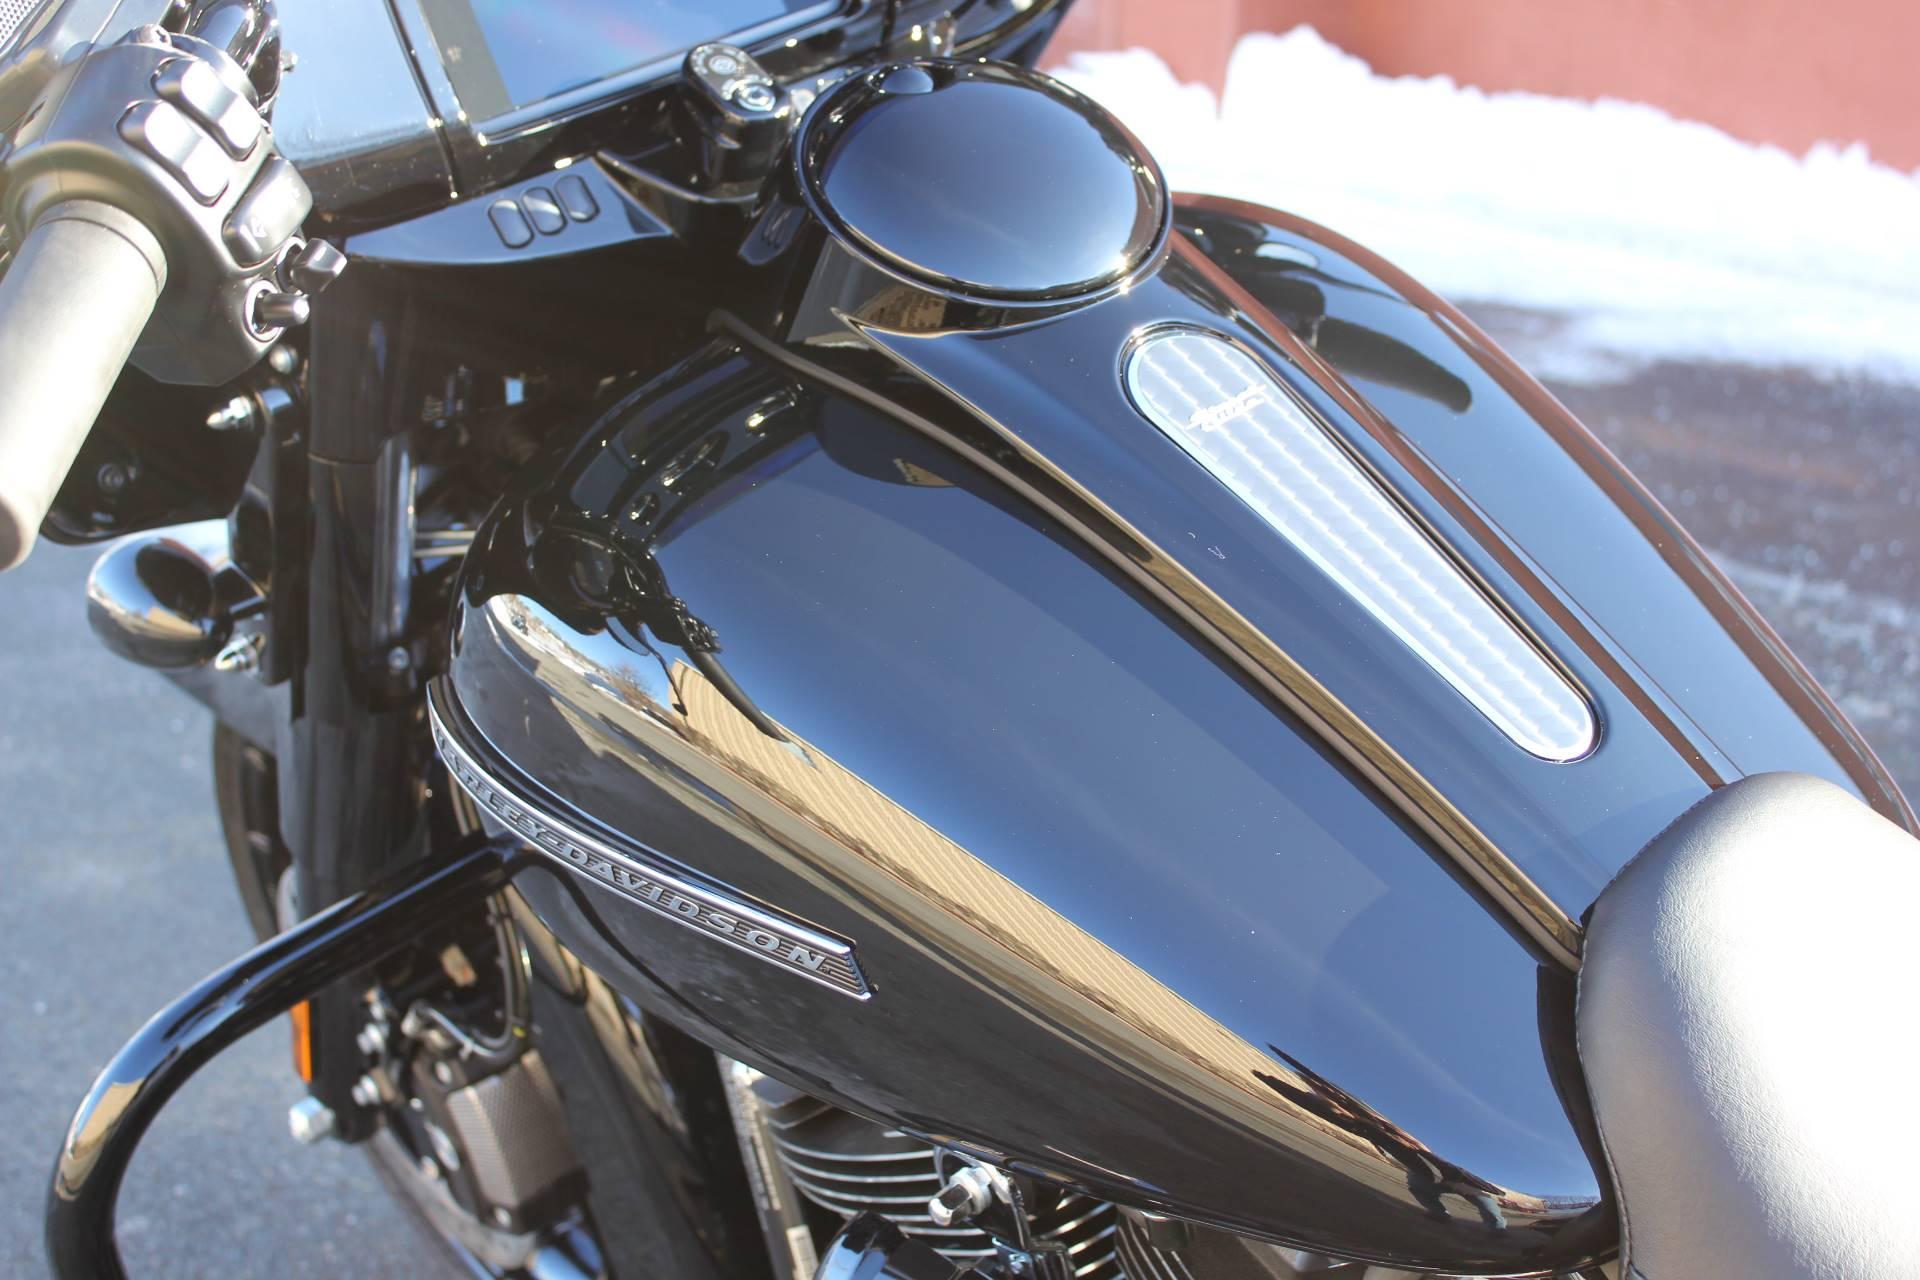 2019 Harley-Davidson Street Glide Special 2